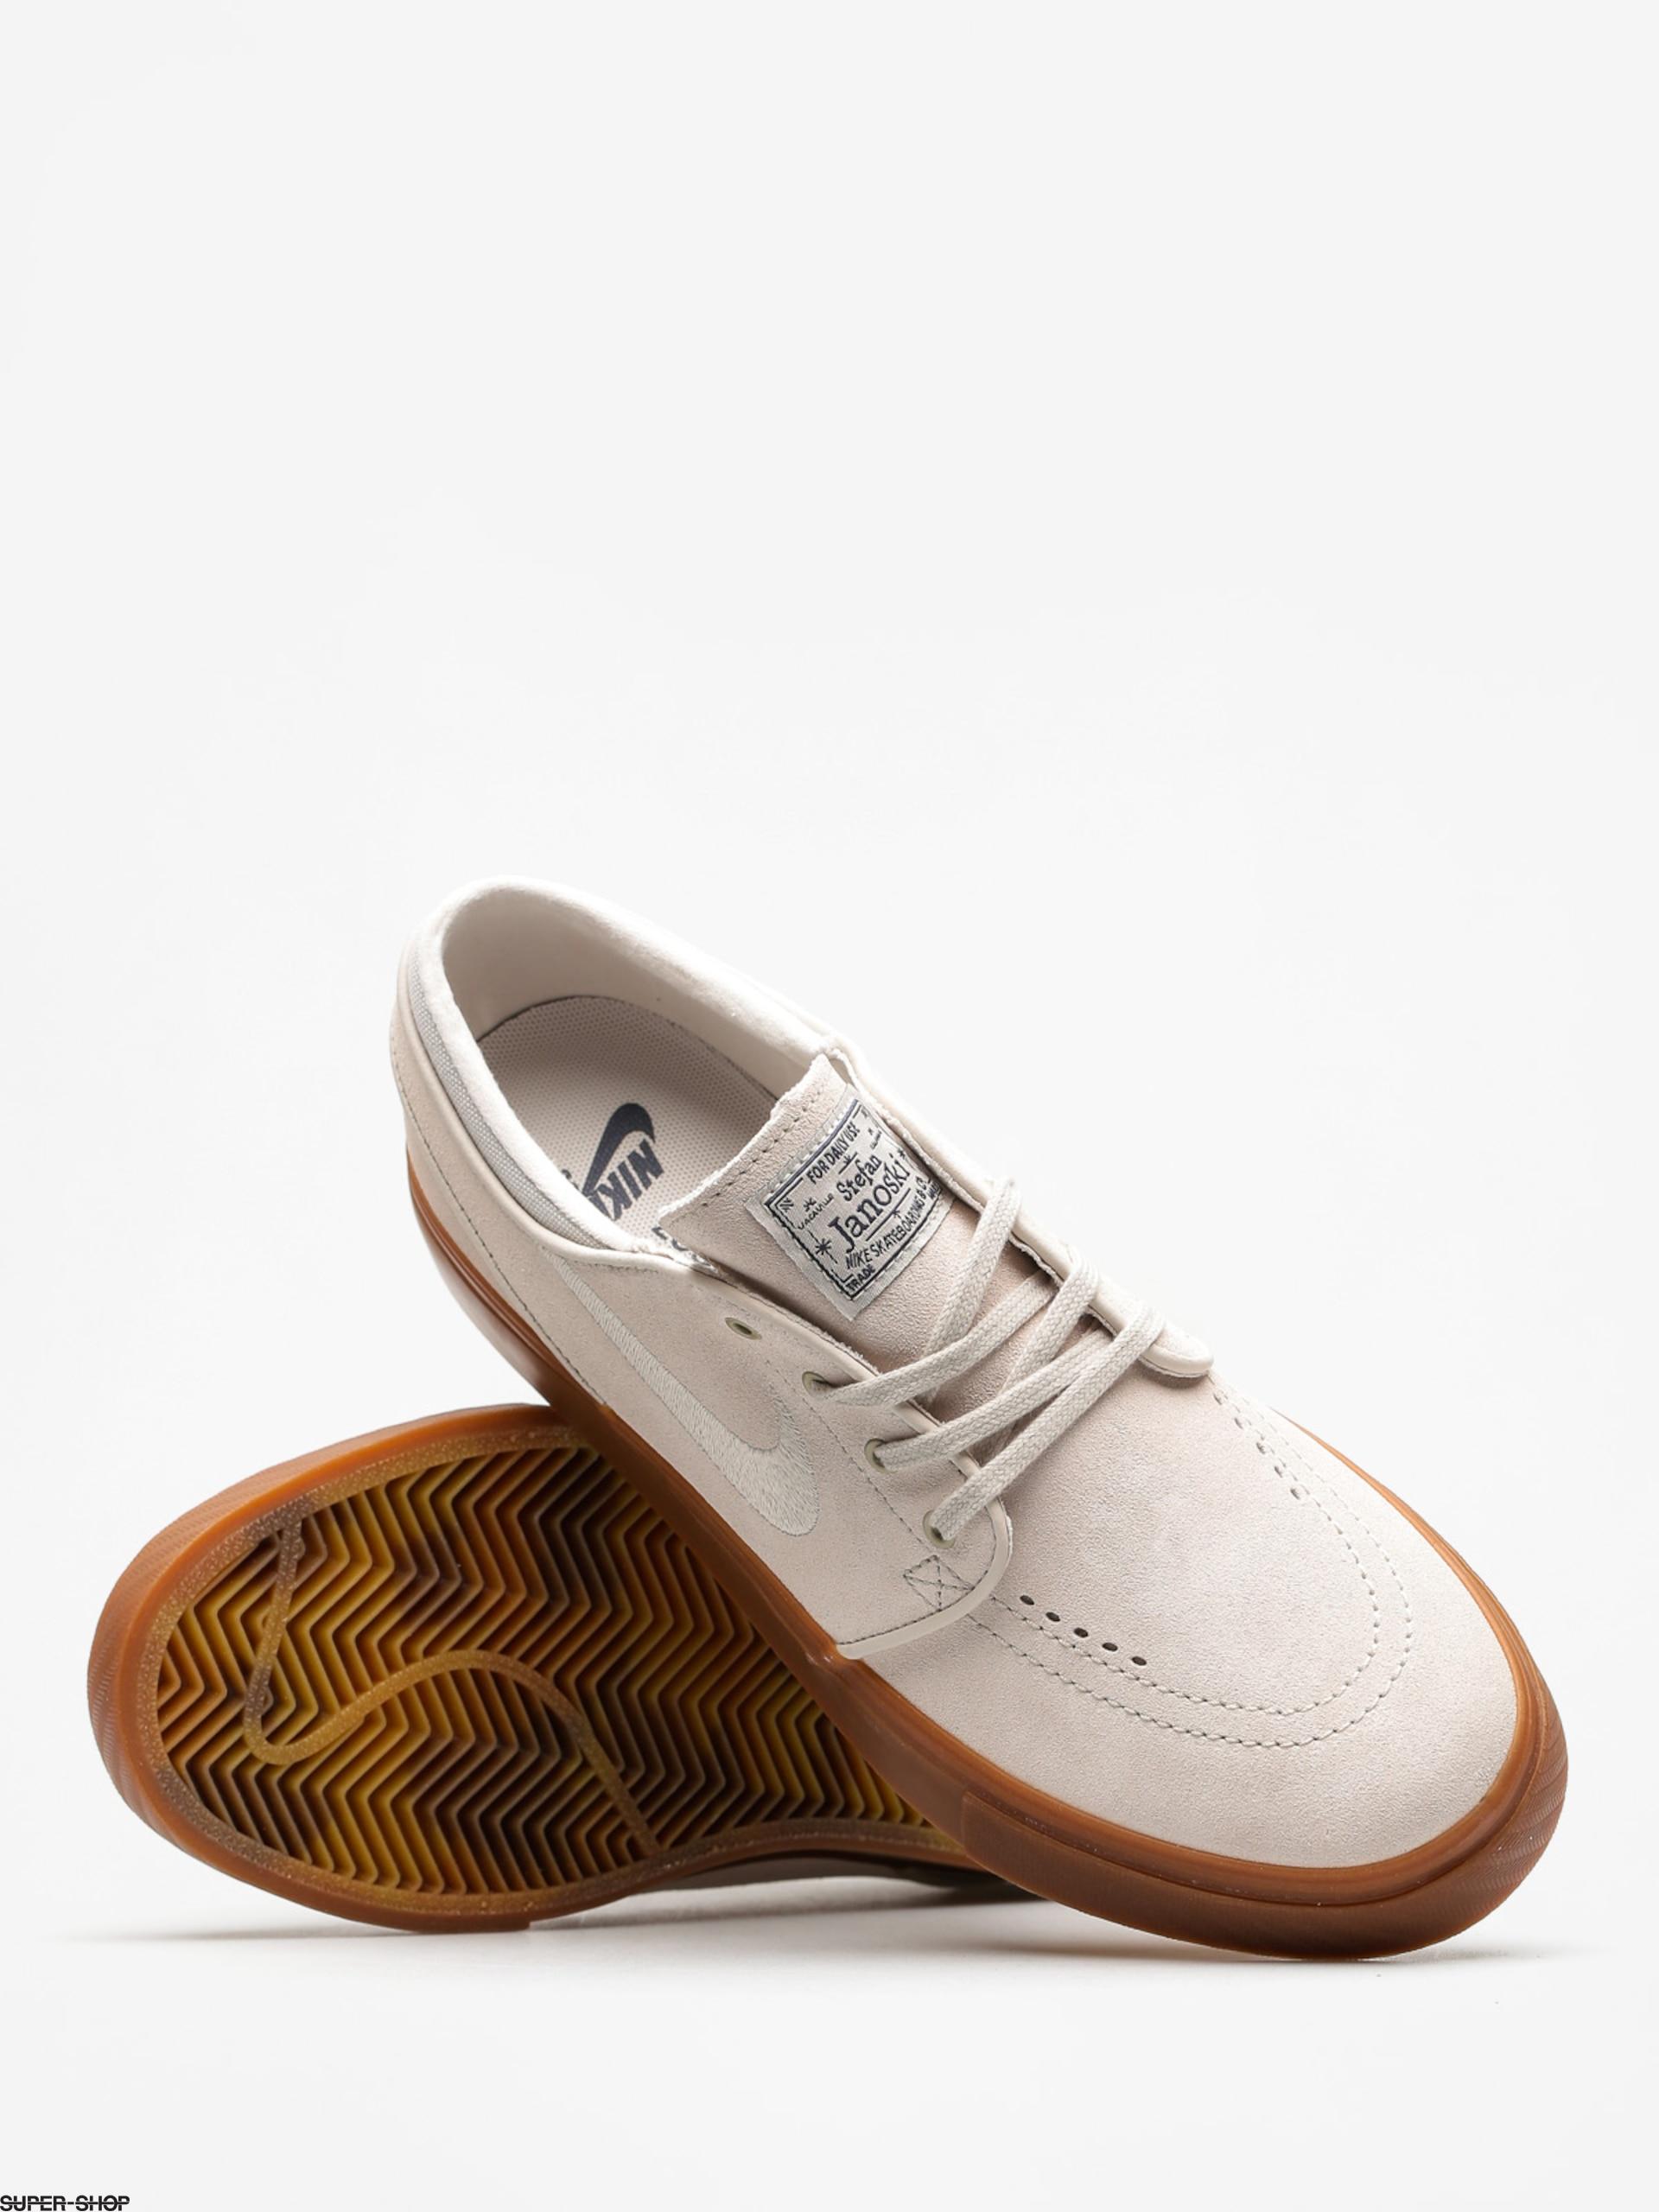 online retailer 5af24 b50c1 Nike SB Shoes Zoom Stefan Janoski (light bonelight bone thun